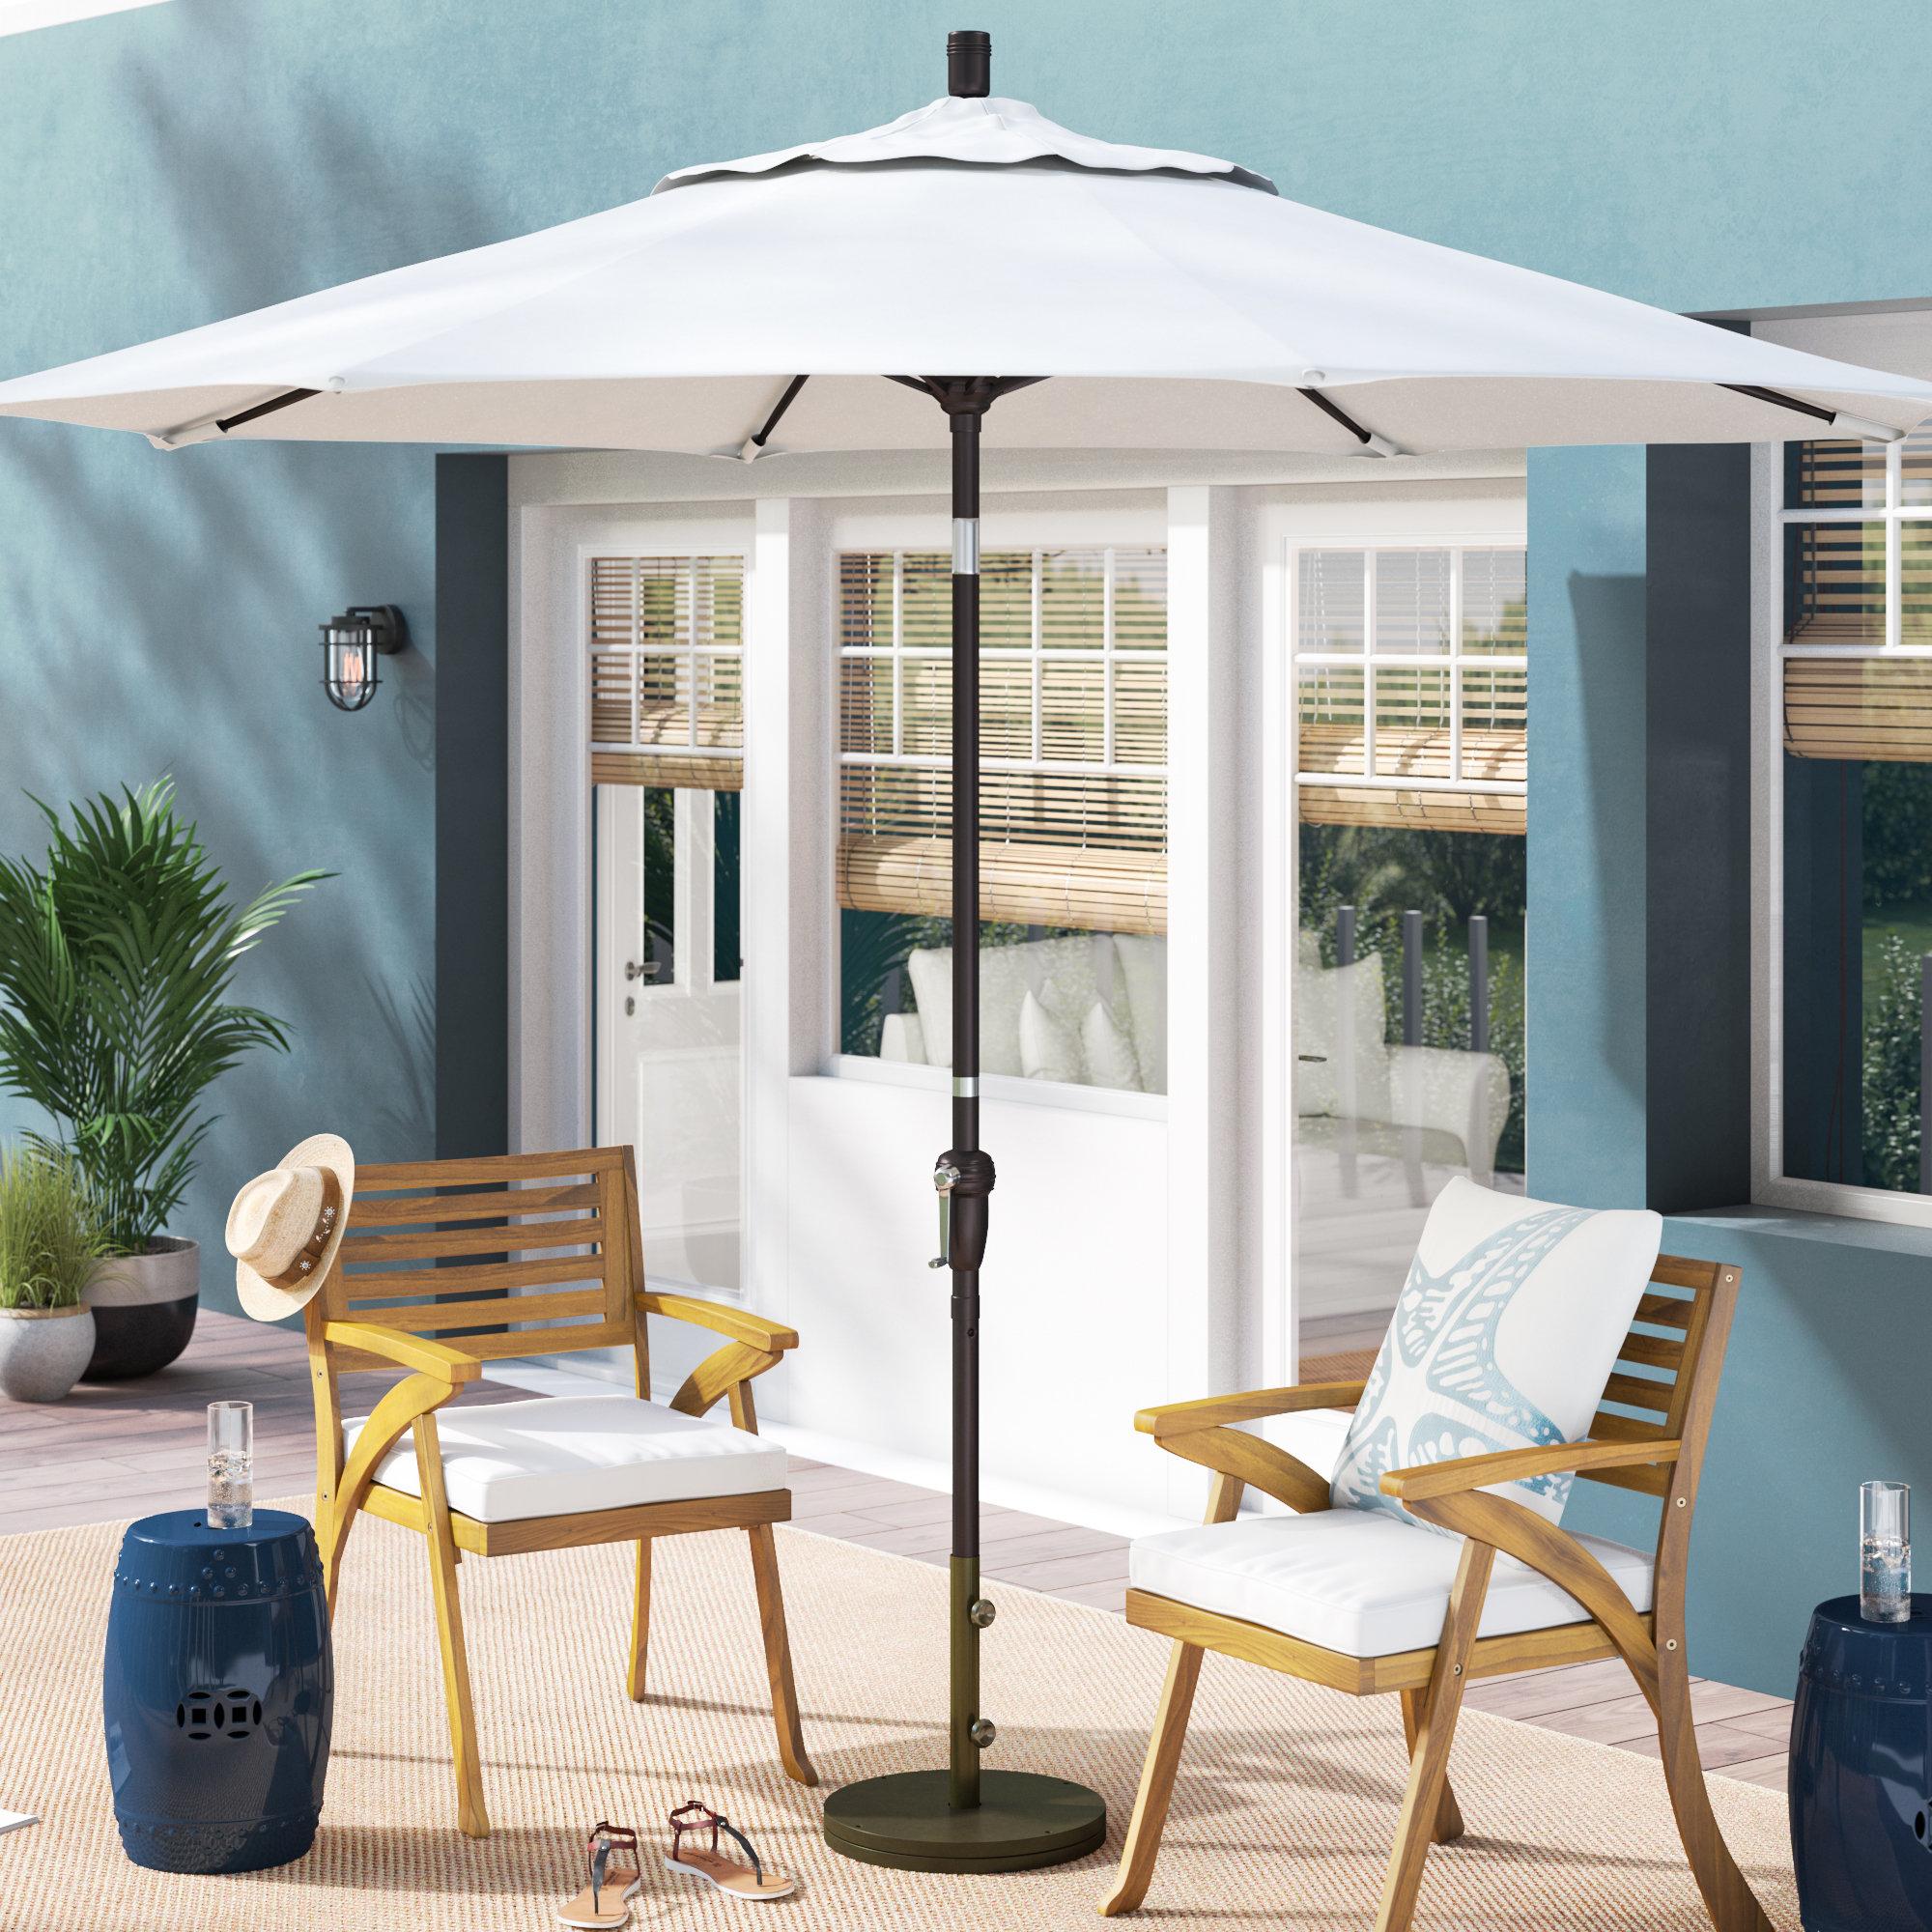 Priscilla 9' Market Umbrella With Regard To 2020 Priscilla Market Umbrellas (View 2 of 20)